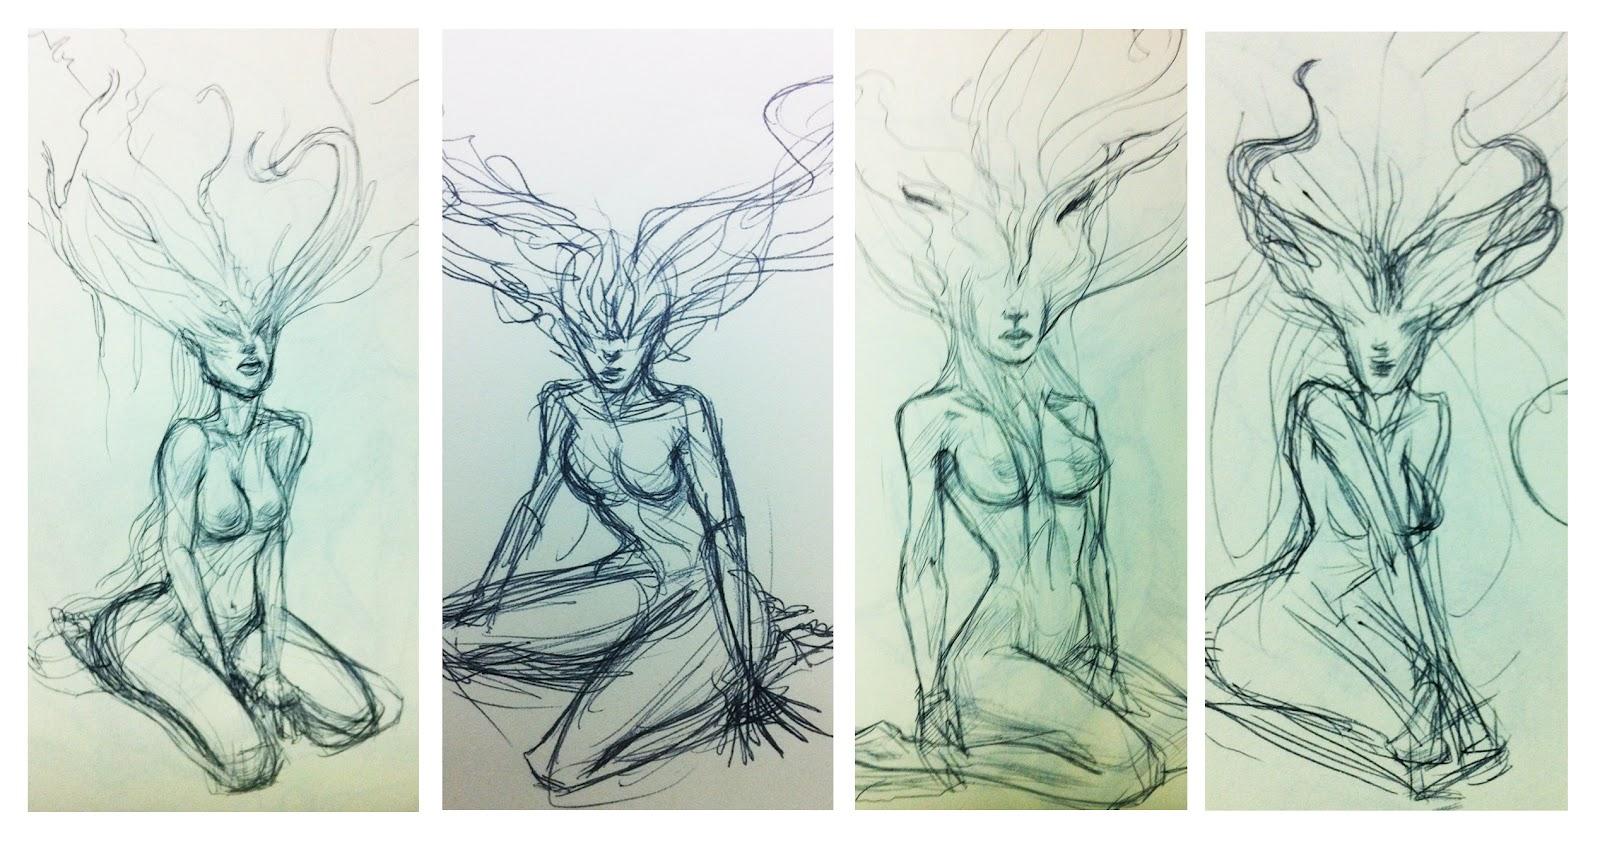 http://2.bp.blogspot.com/-XnSz6WOGQdg/TzfBsly-xpI/AAAAAAAABVU/wotV19YD_As/s1600/evolved_nude_sketches.jpg